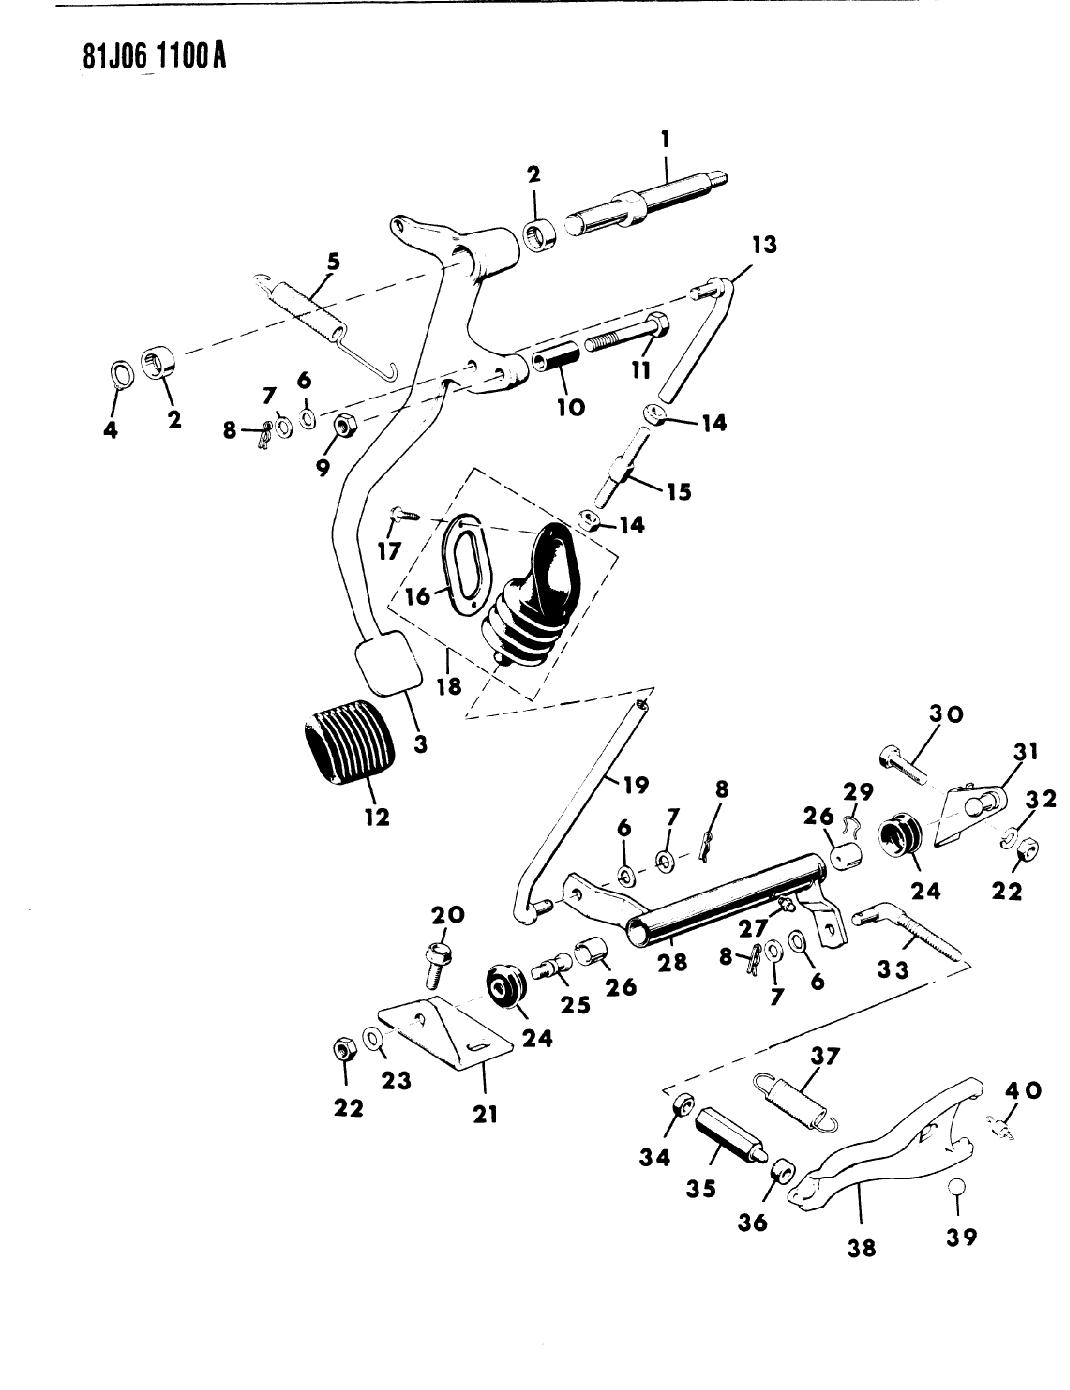 1985 Jeep J20 Pedal - Clutch Linkage